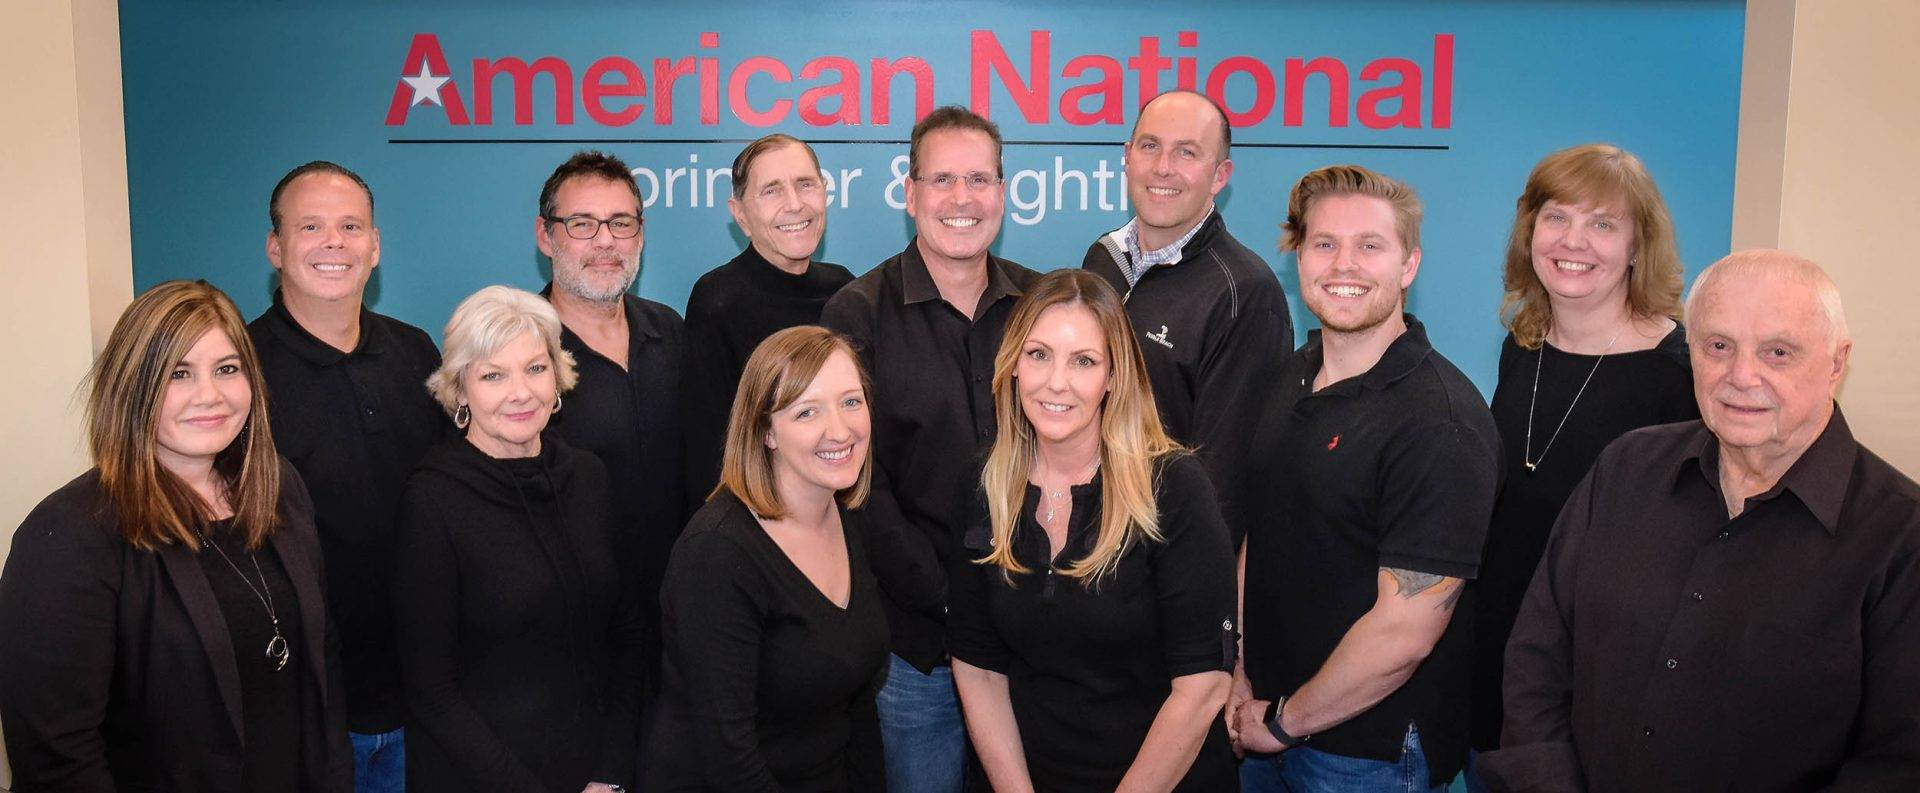 team-bio-background-image-group